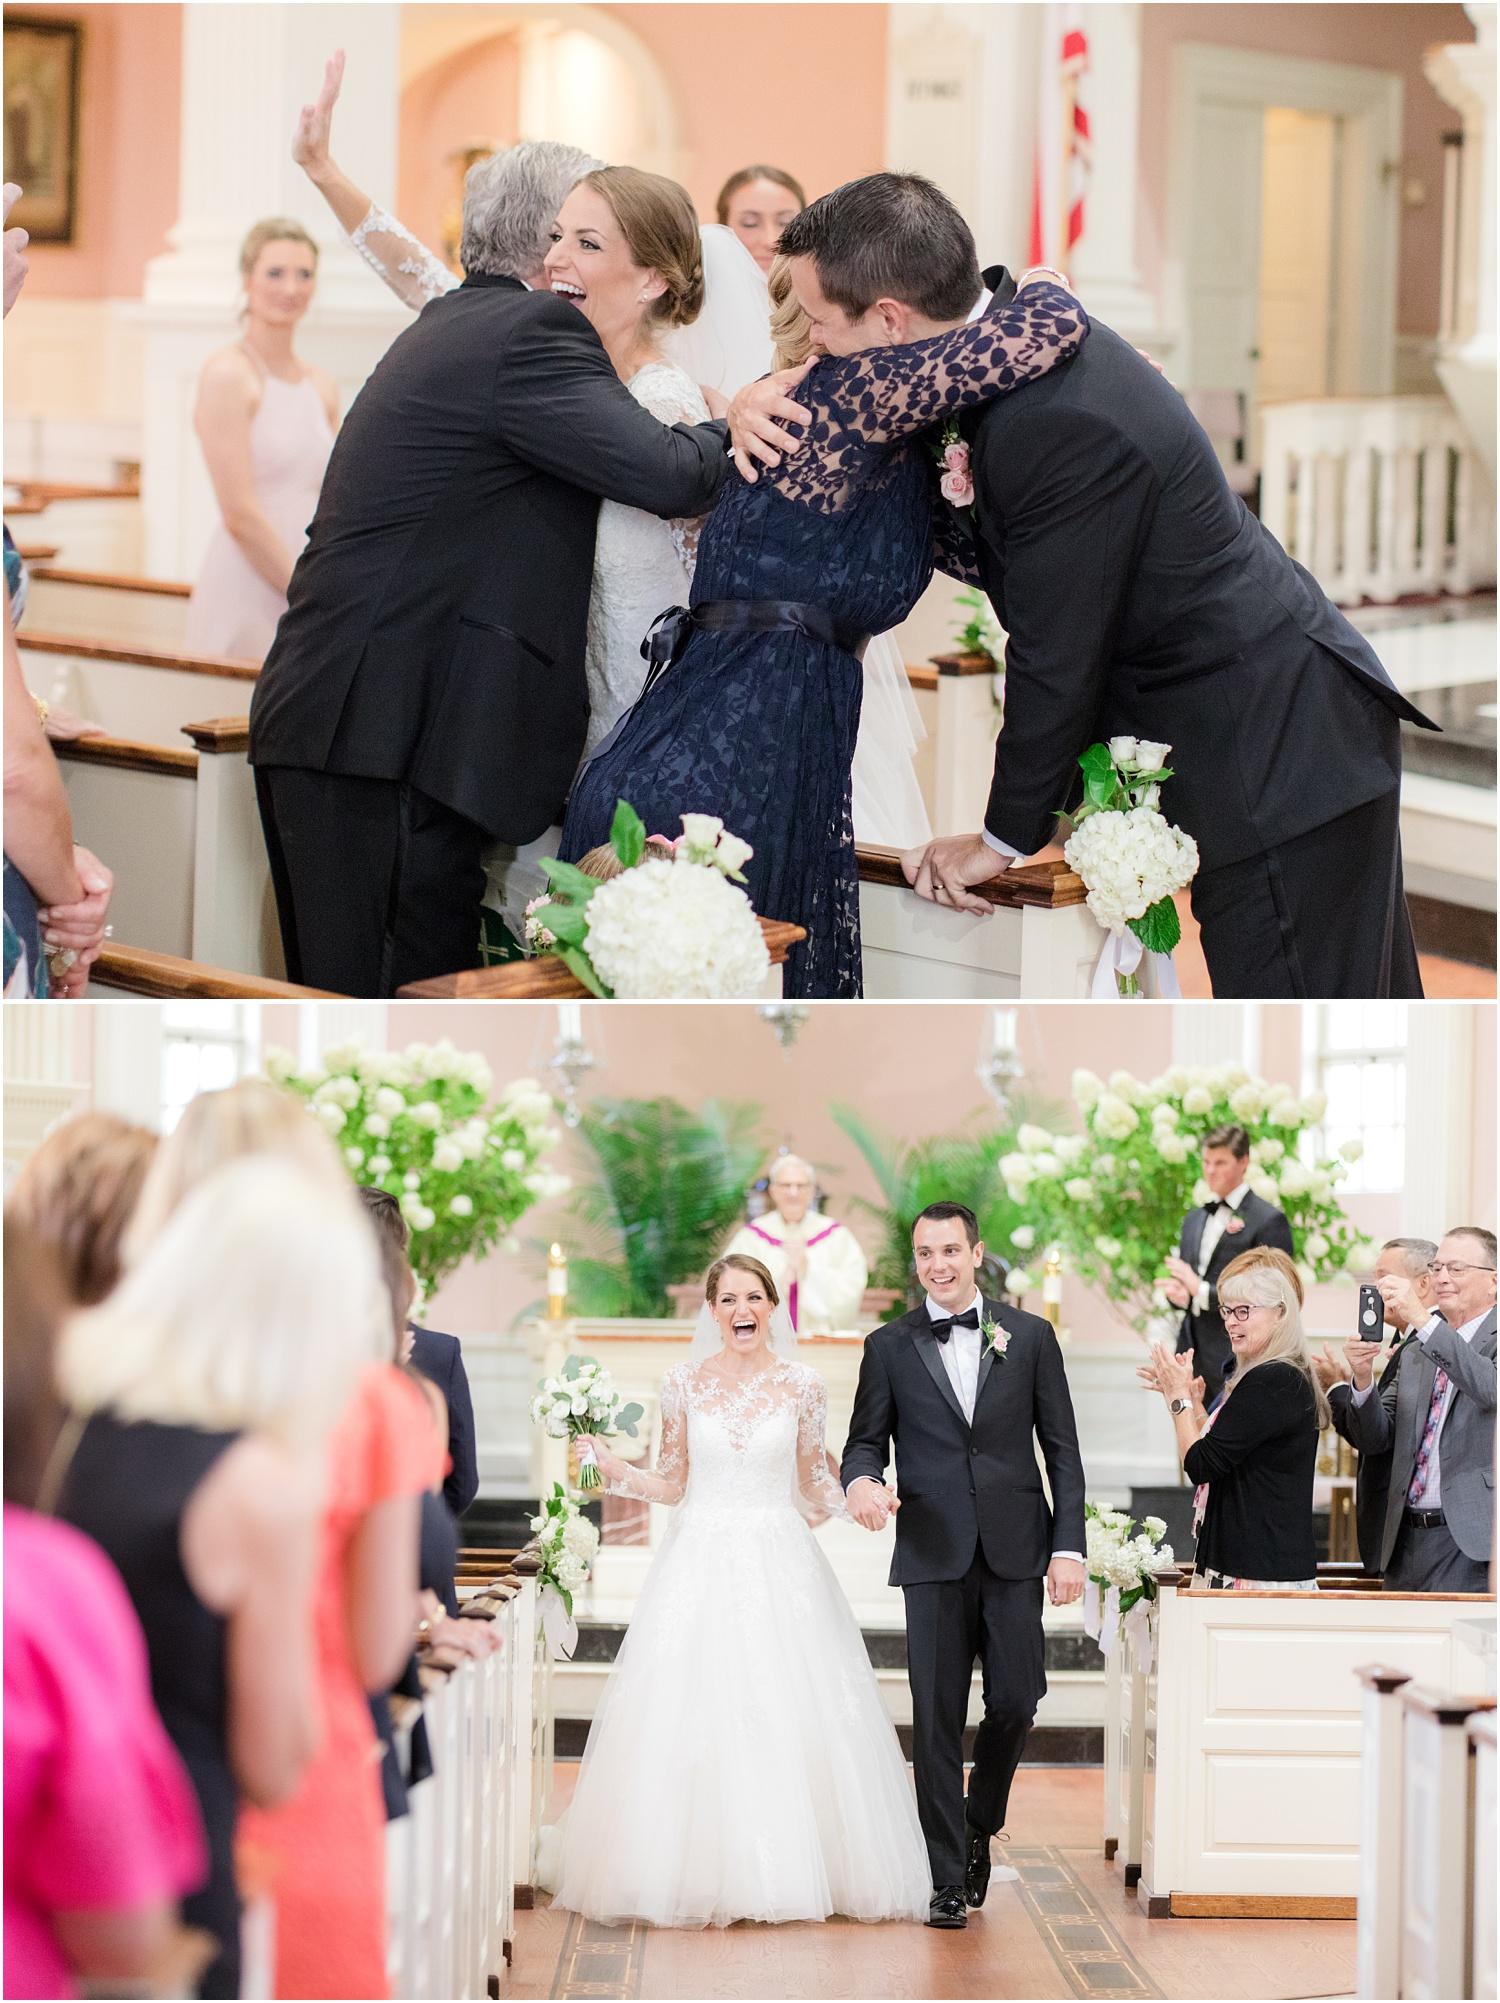 Wedding ceremony exit at St. Rose of Lima in Short Hills, NJ.